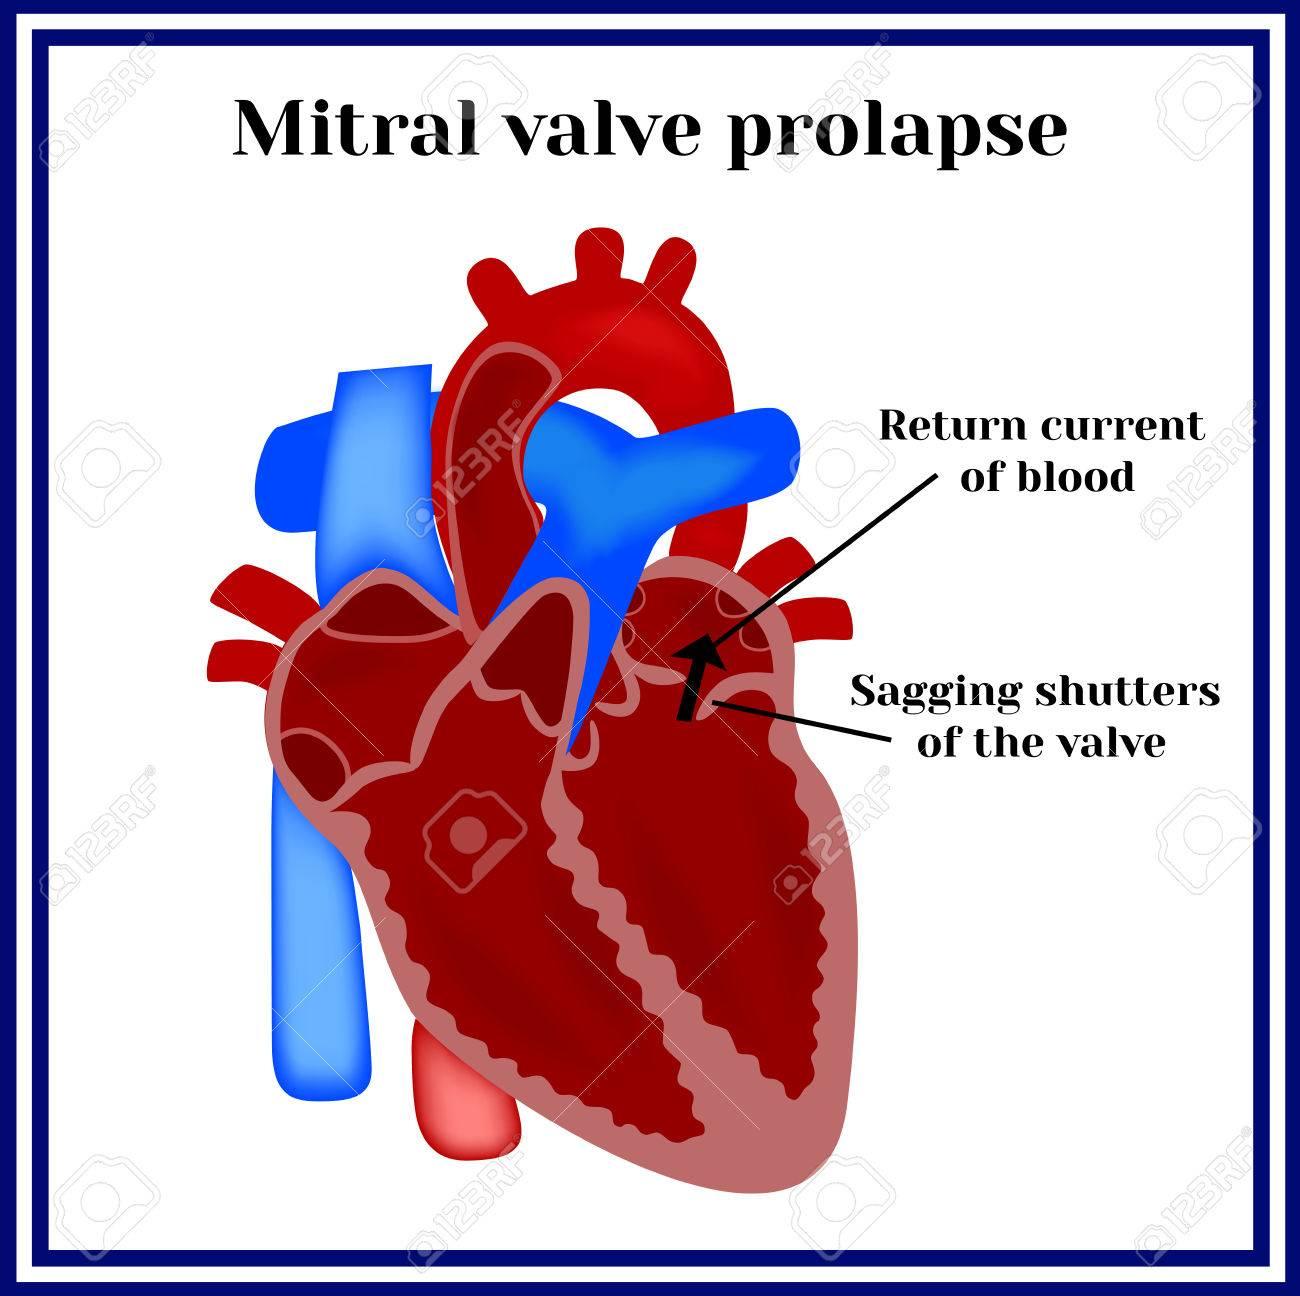 mitral valve prolapse  cardiac pathology  stock vector - 62198653